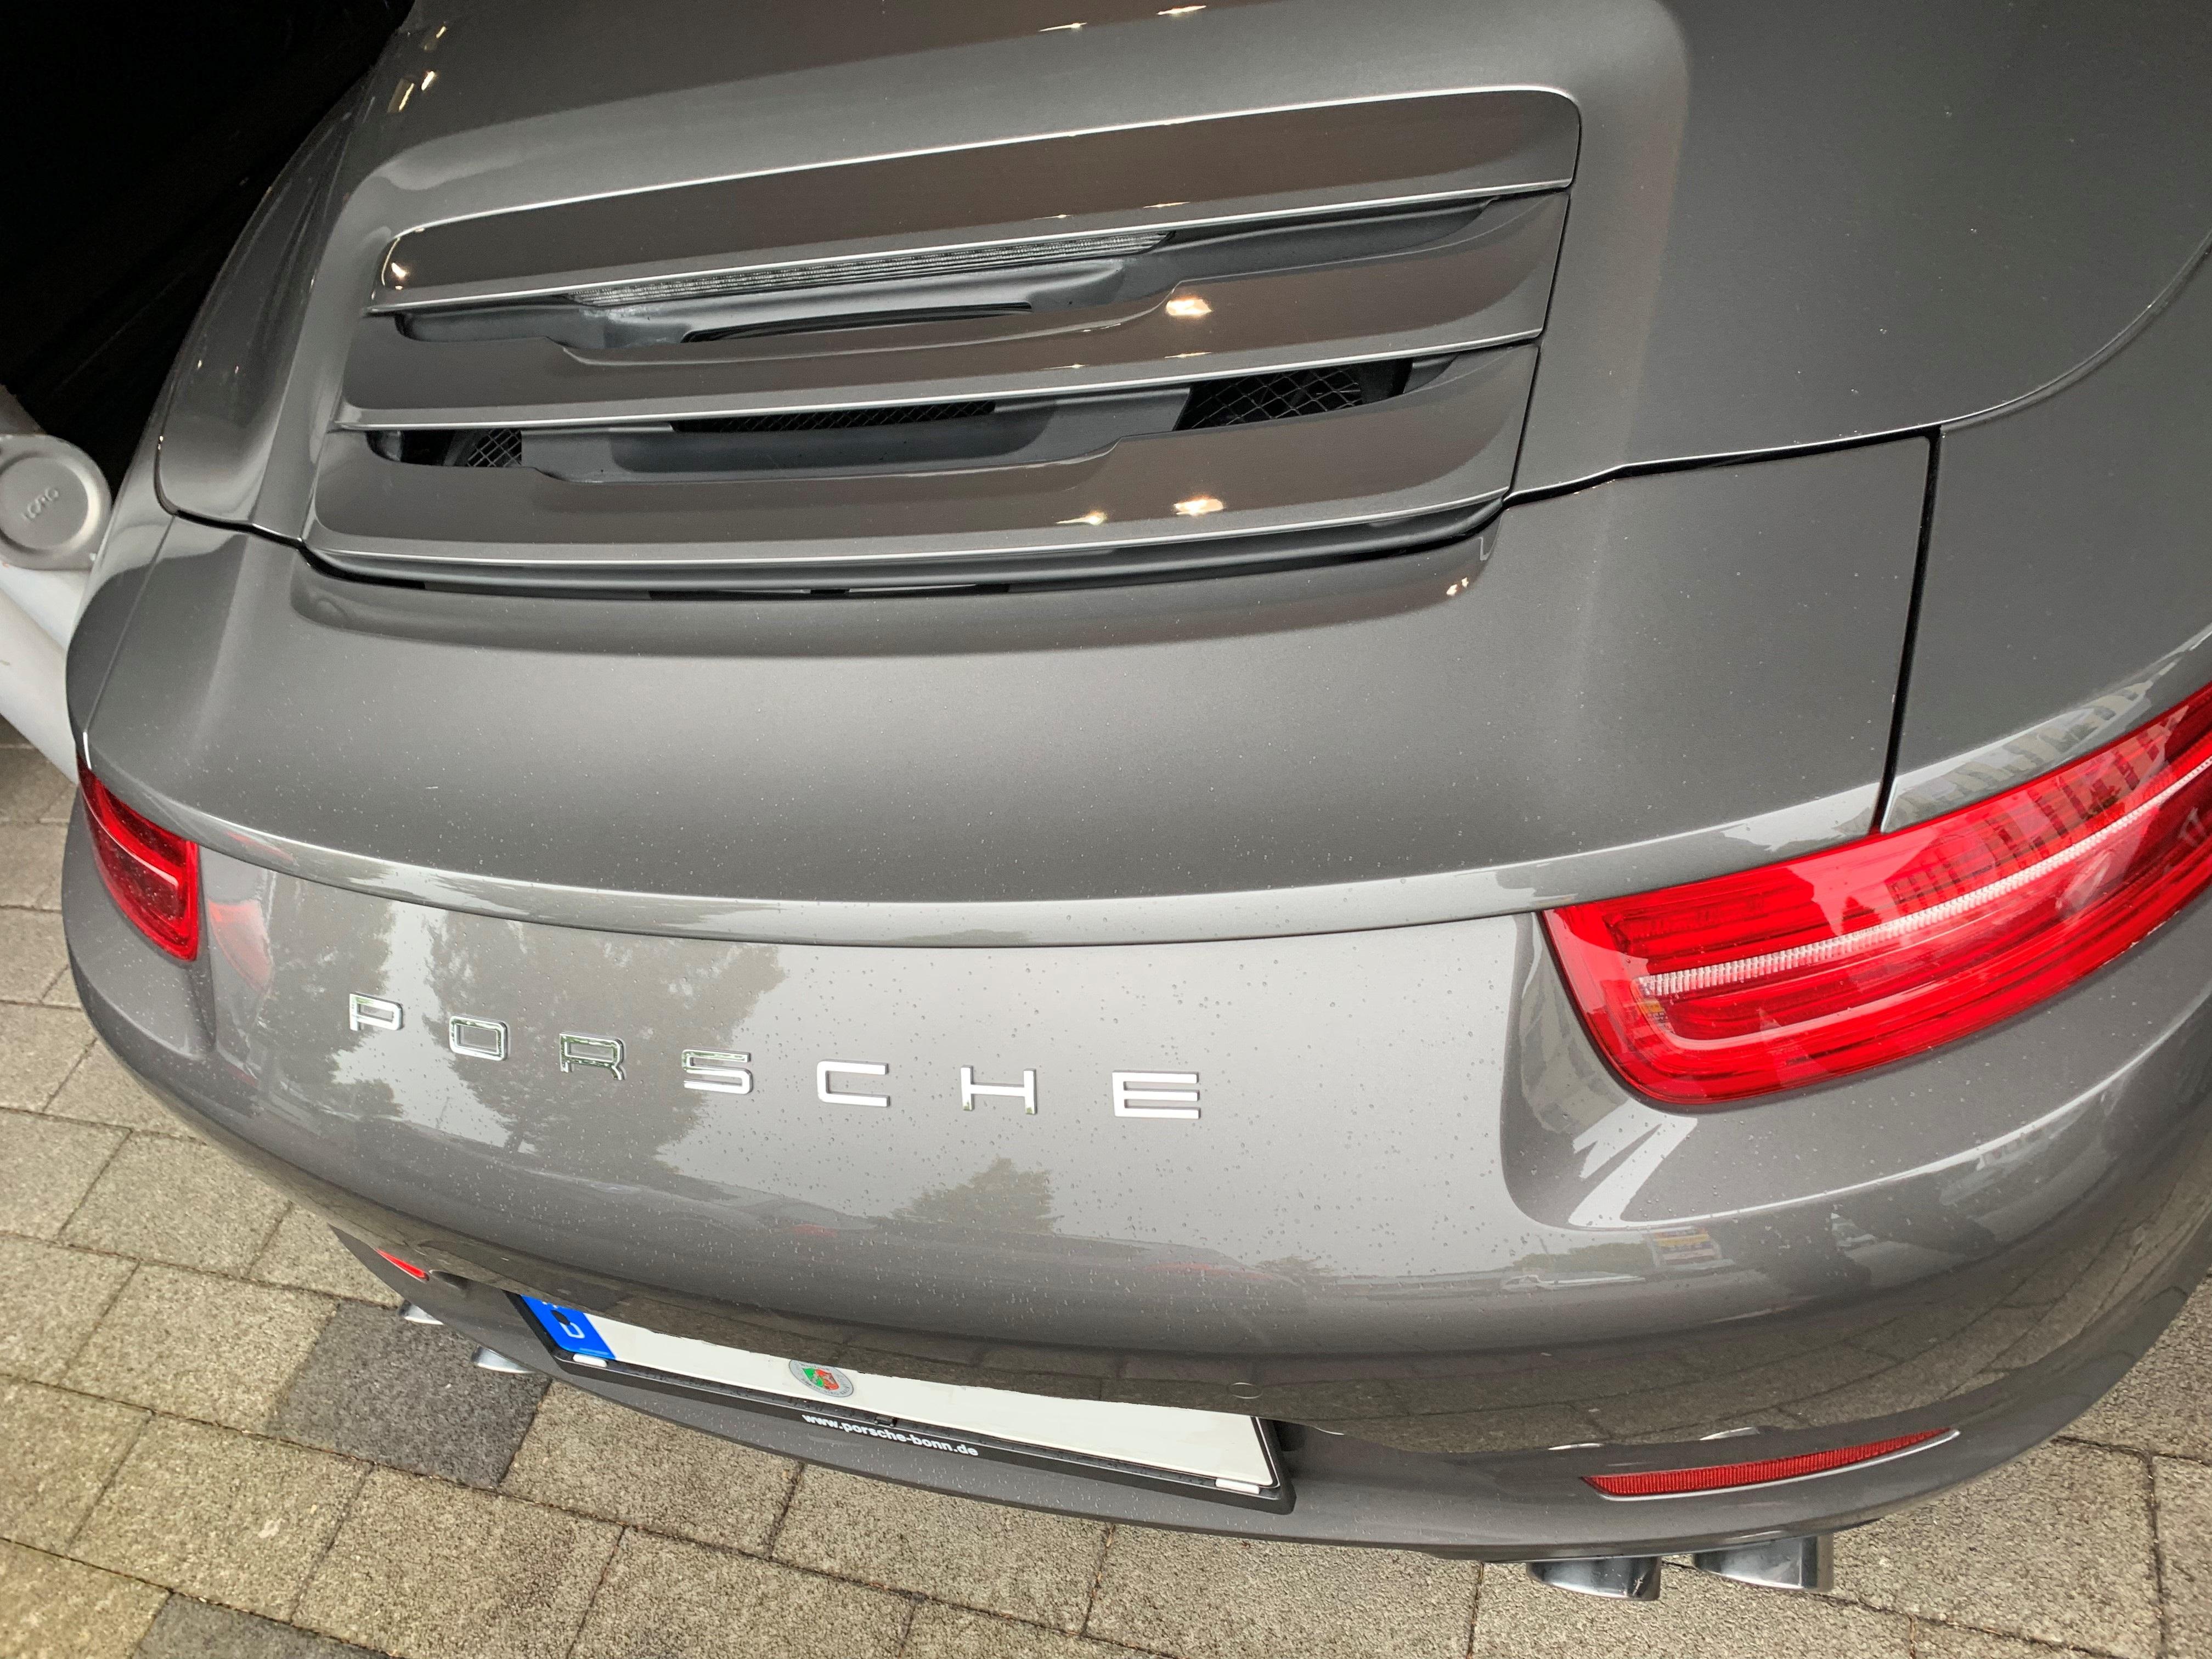 Für Porsche 991.1 911 GTS 4 S Echt Carbon Heck Spoiler Heckspoiler